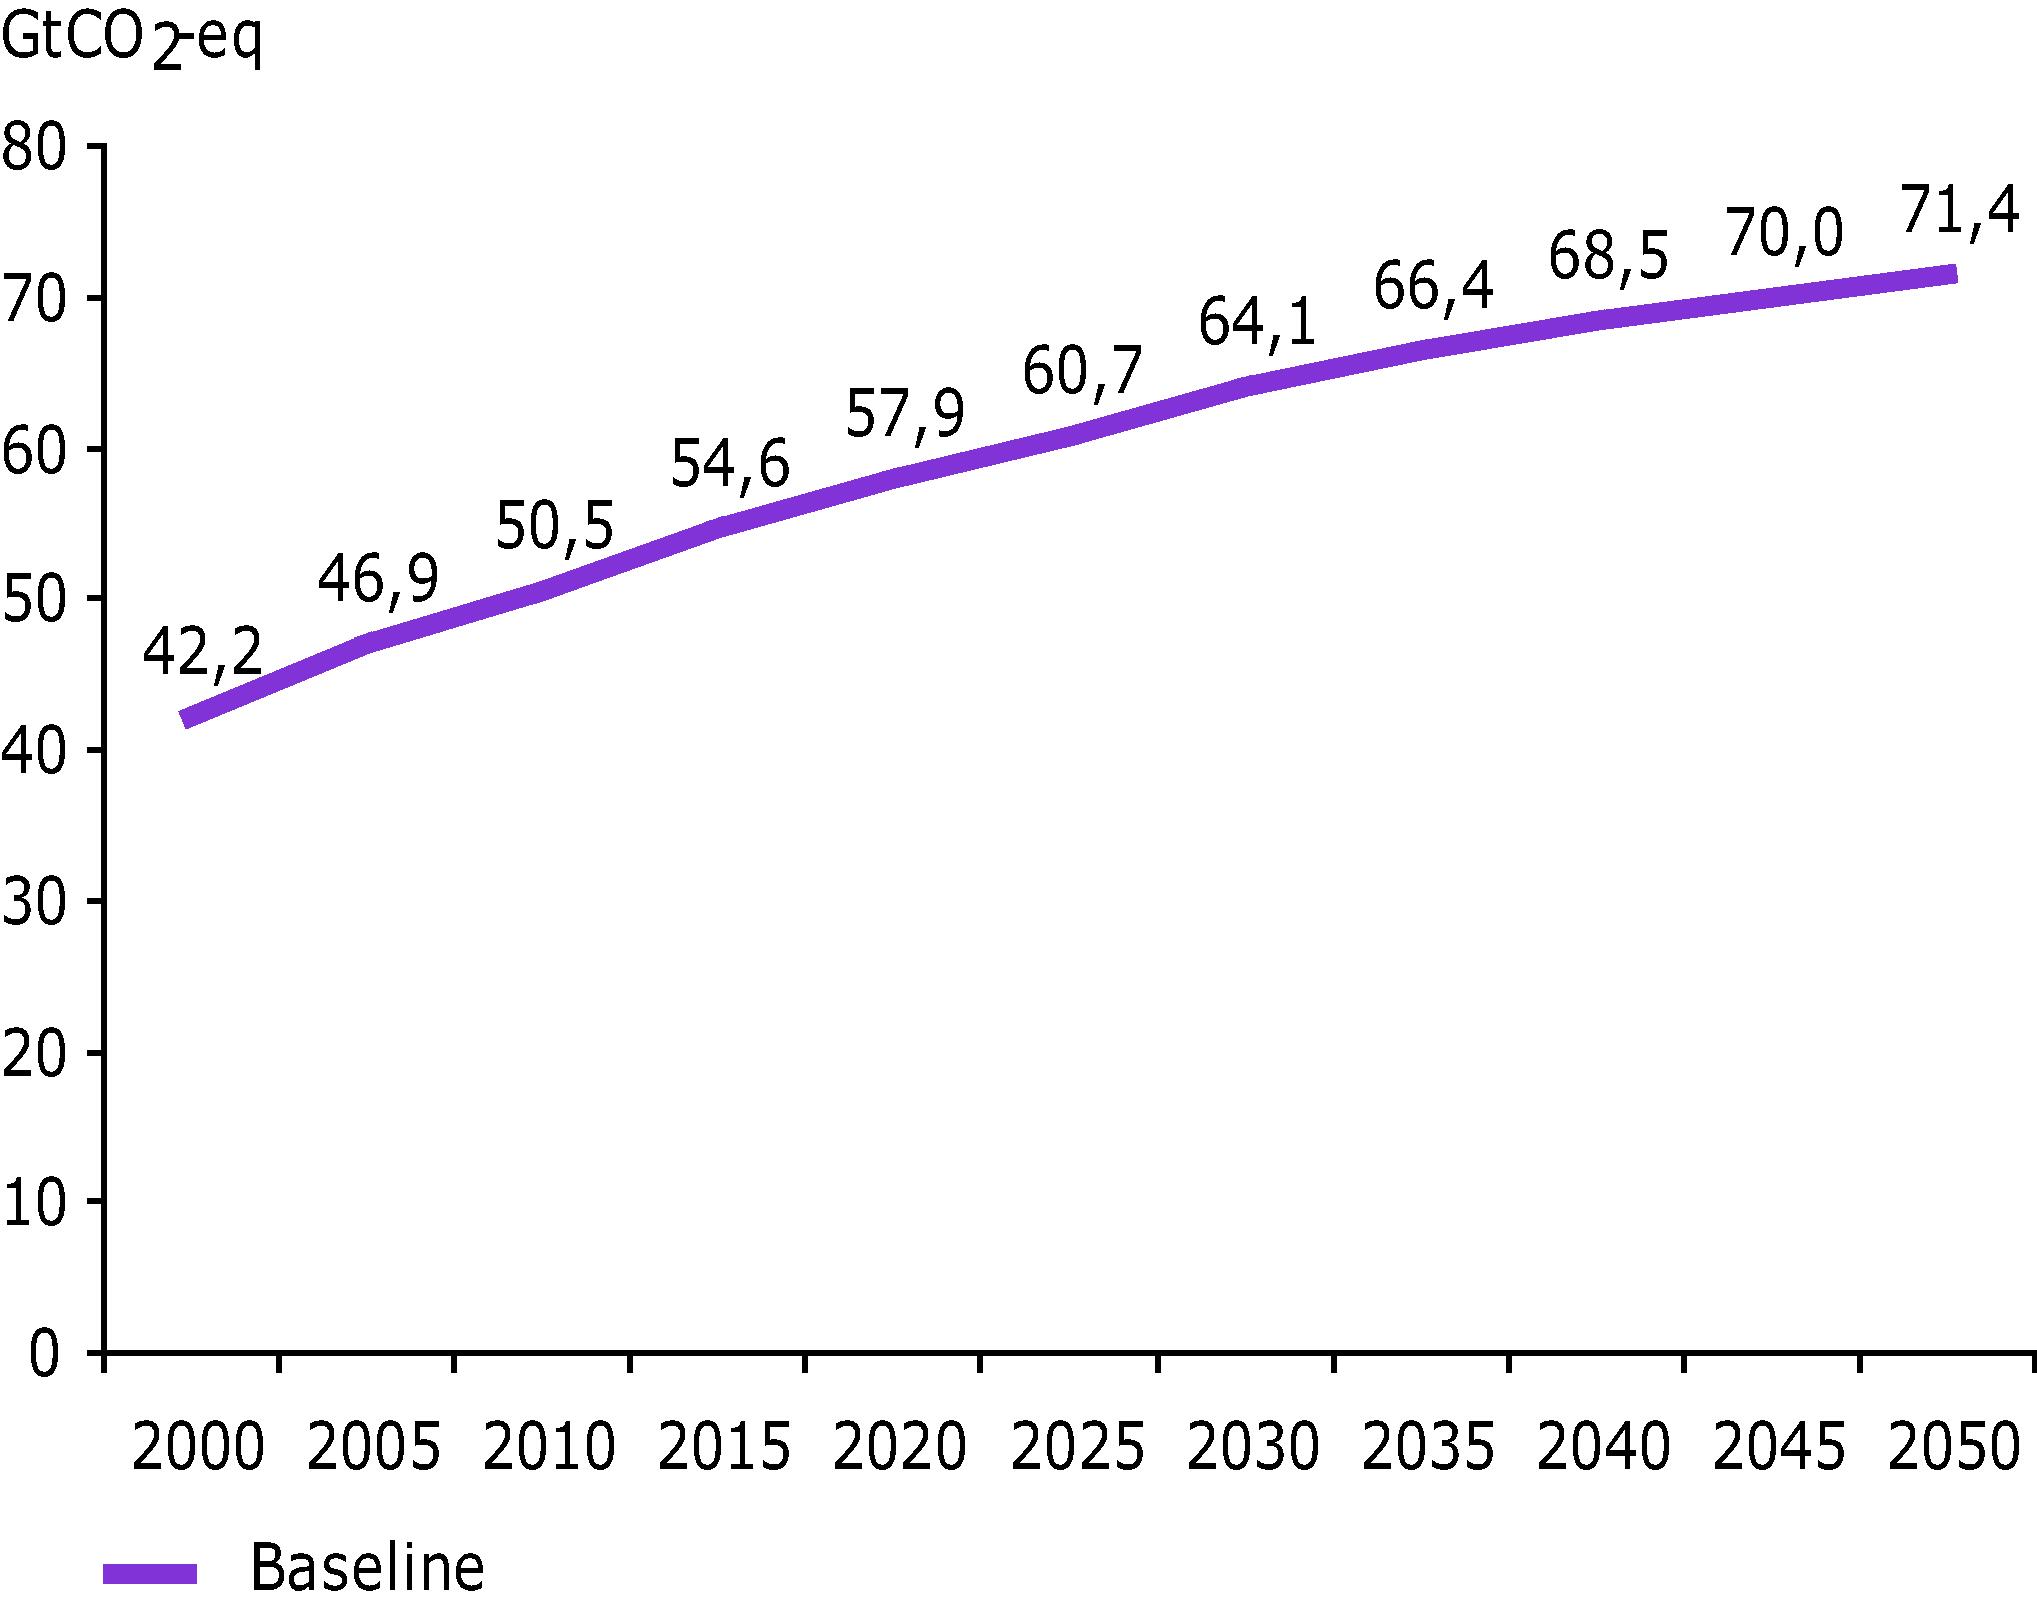 GHG emissions according to the baseline scenario